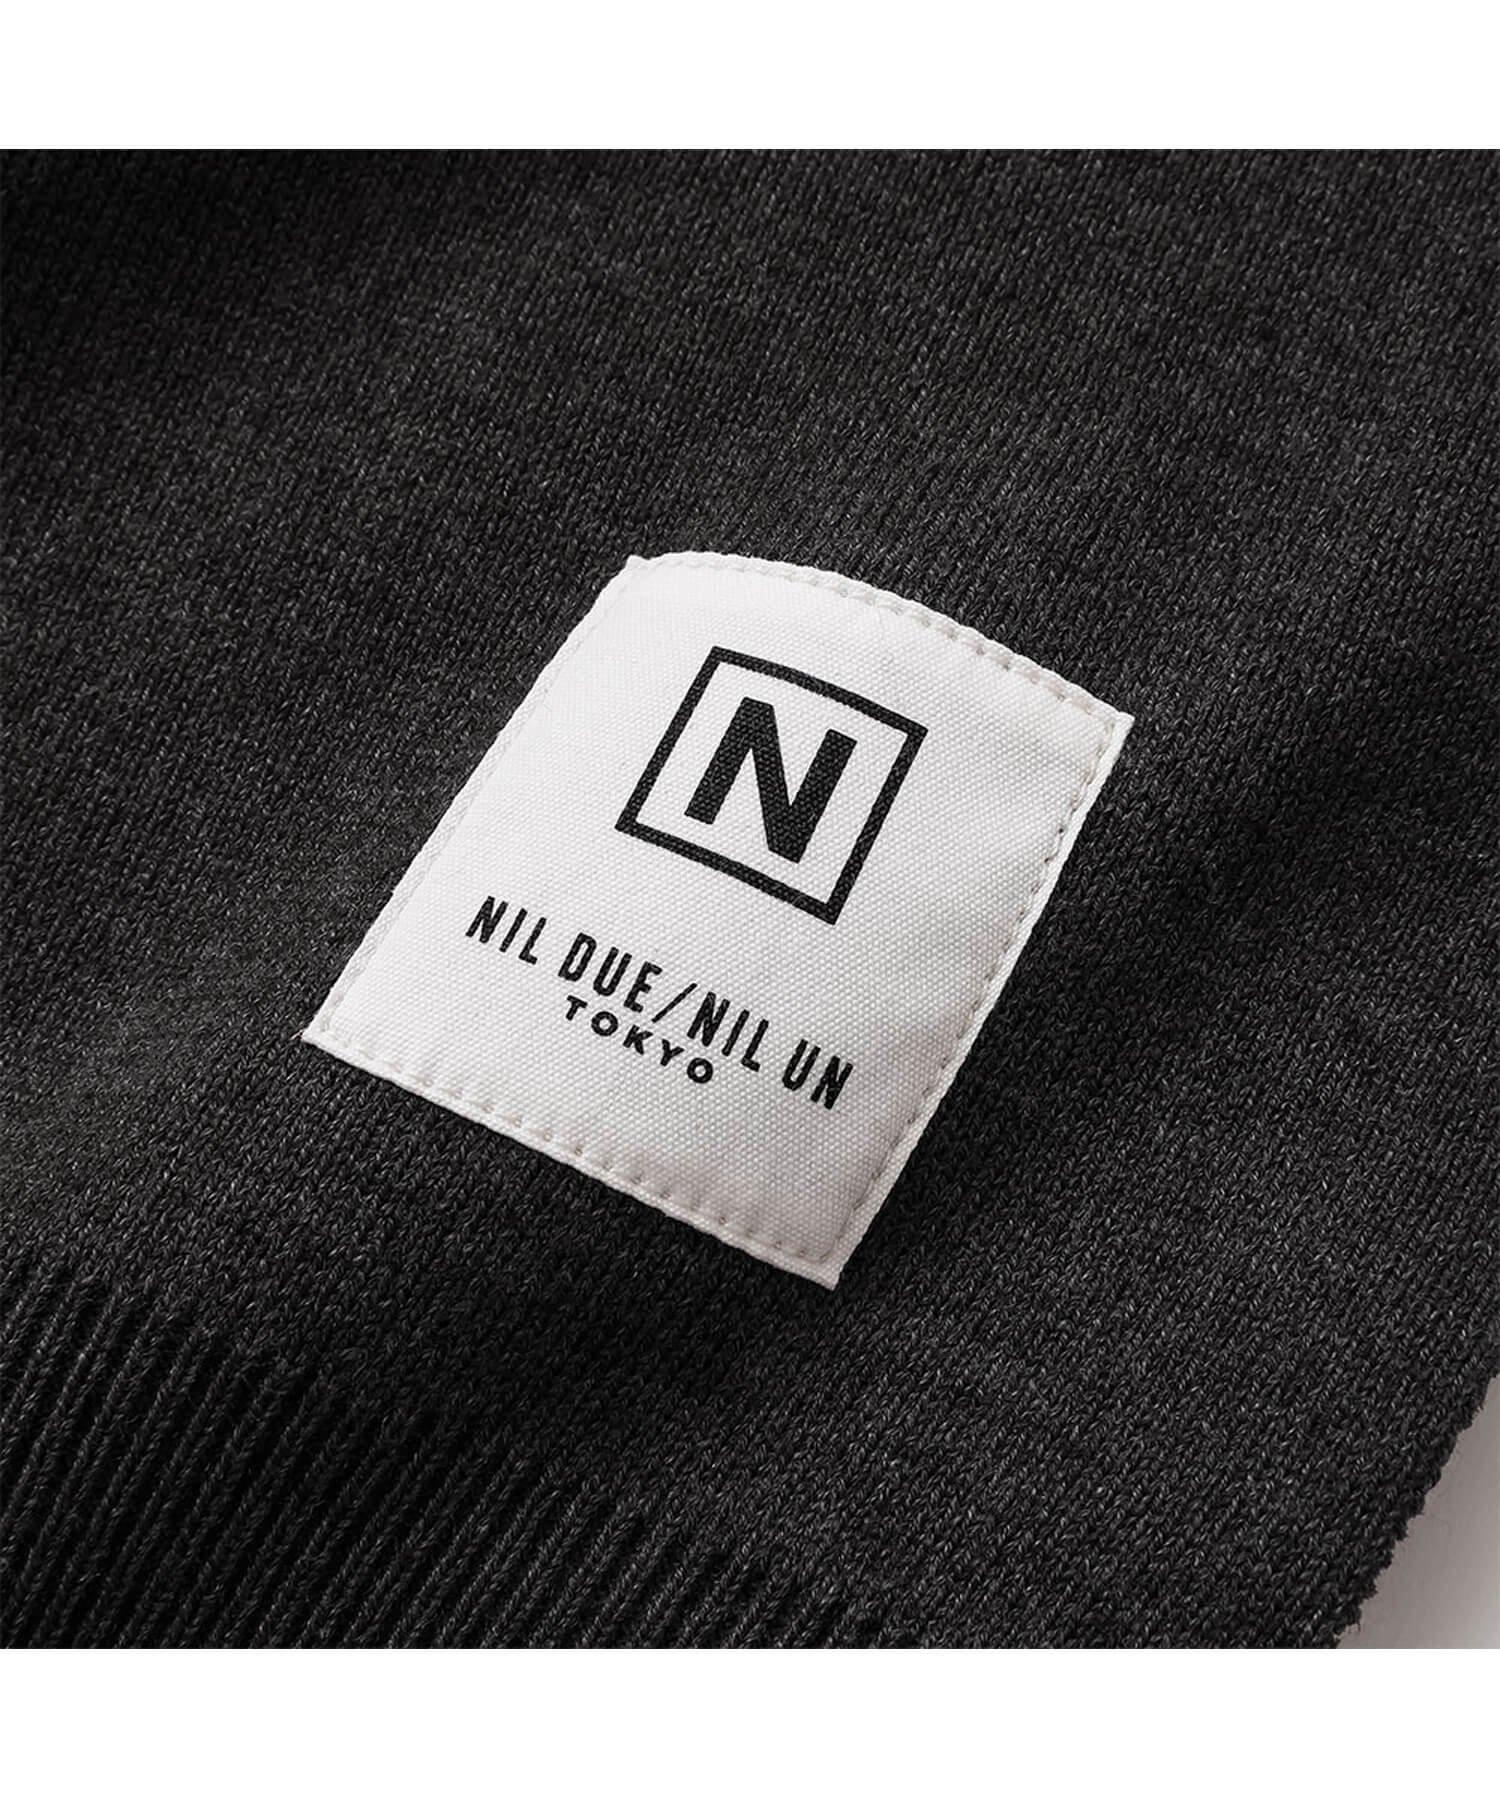 NIL DUE / NIL UN TOKYO / ニル デュエ / ニル アン トーキョー | RIB KNIT LOUNGE SET (BLACK) 商品画像5